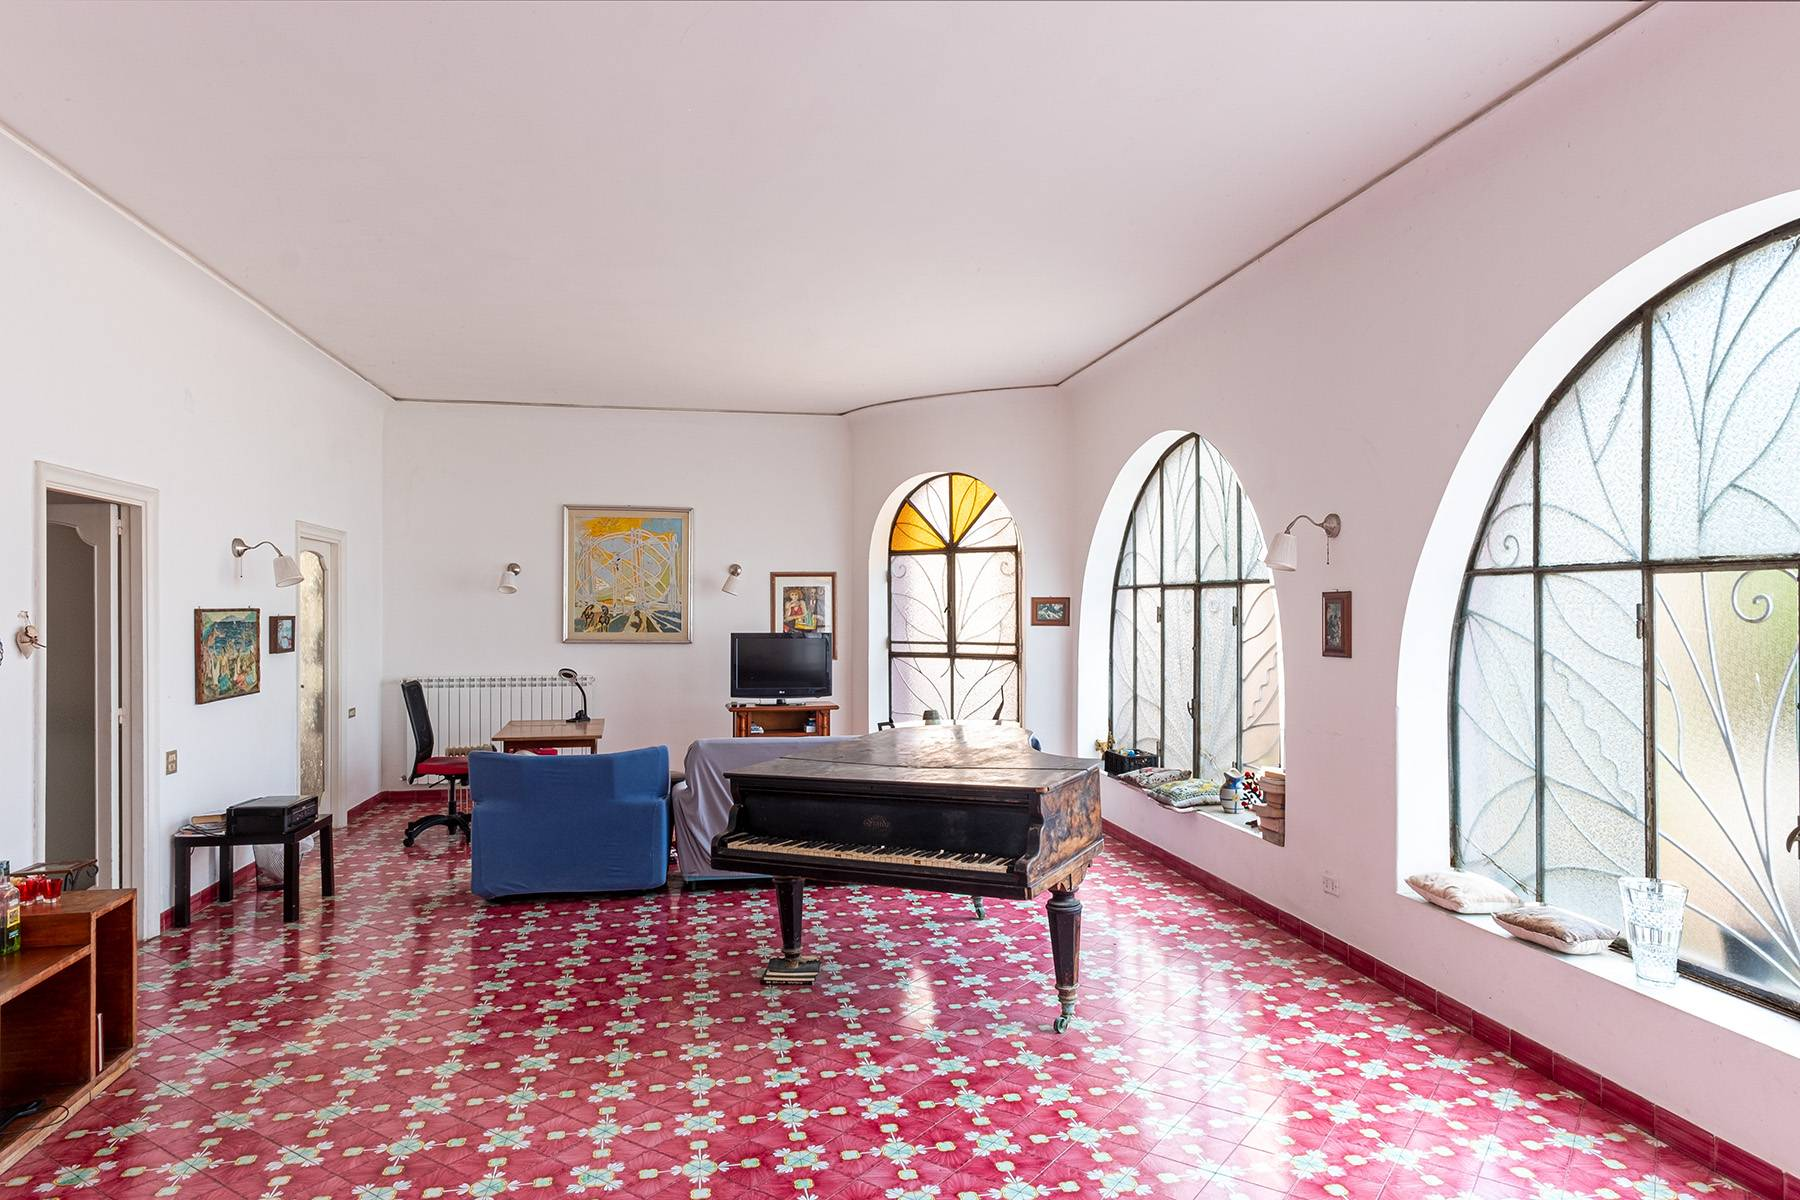 Casa indipendente in Vendita a Procida: 5 locali, 300 mq - Foto 2